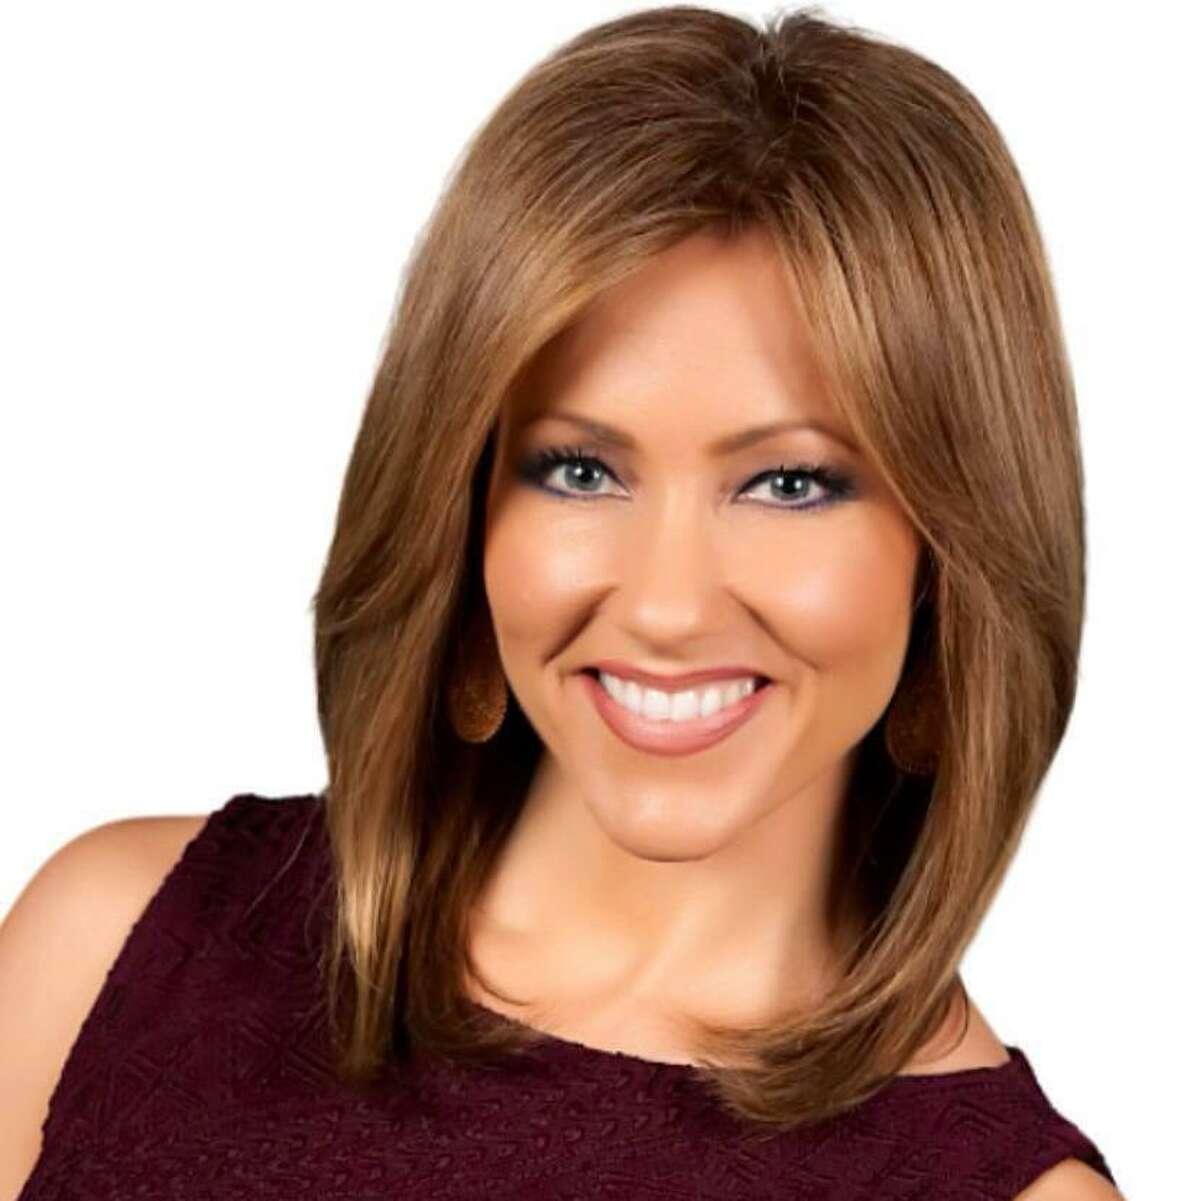 Delaine Mathieu, WOAI anchorwoman